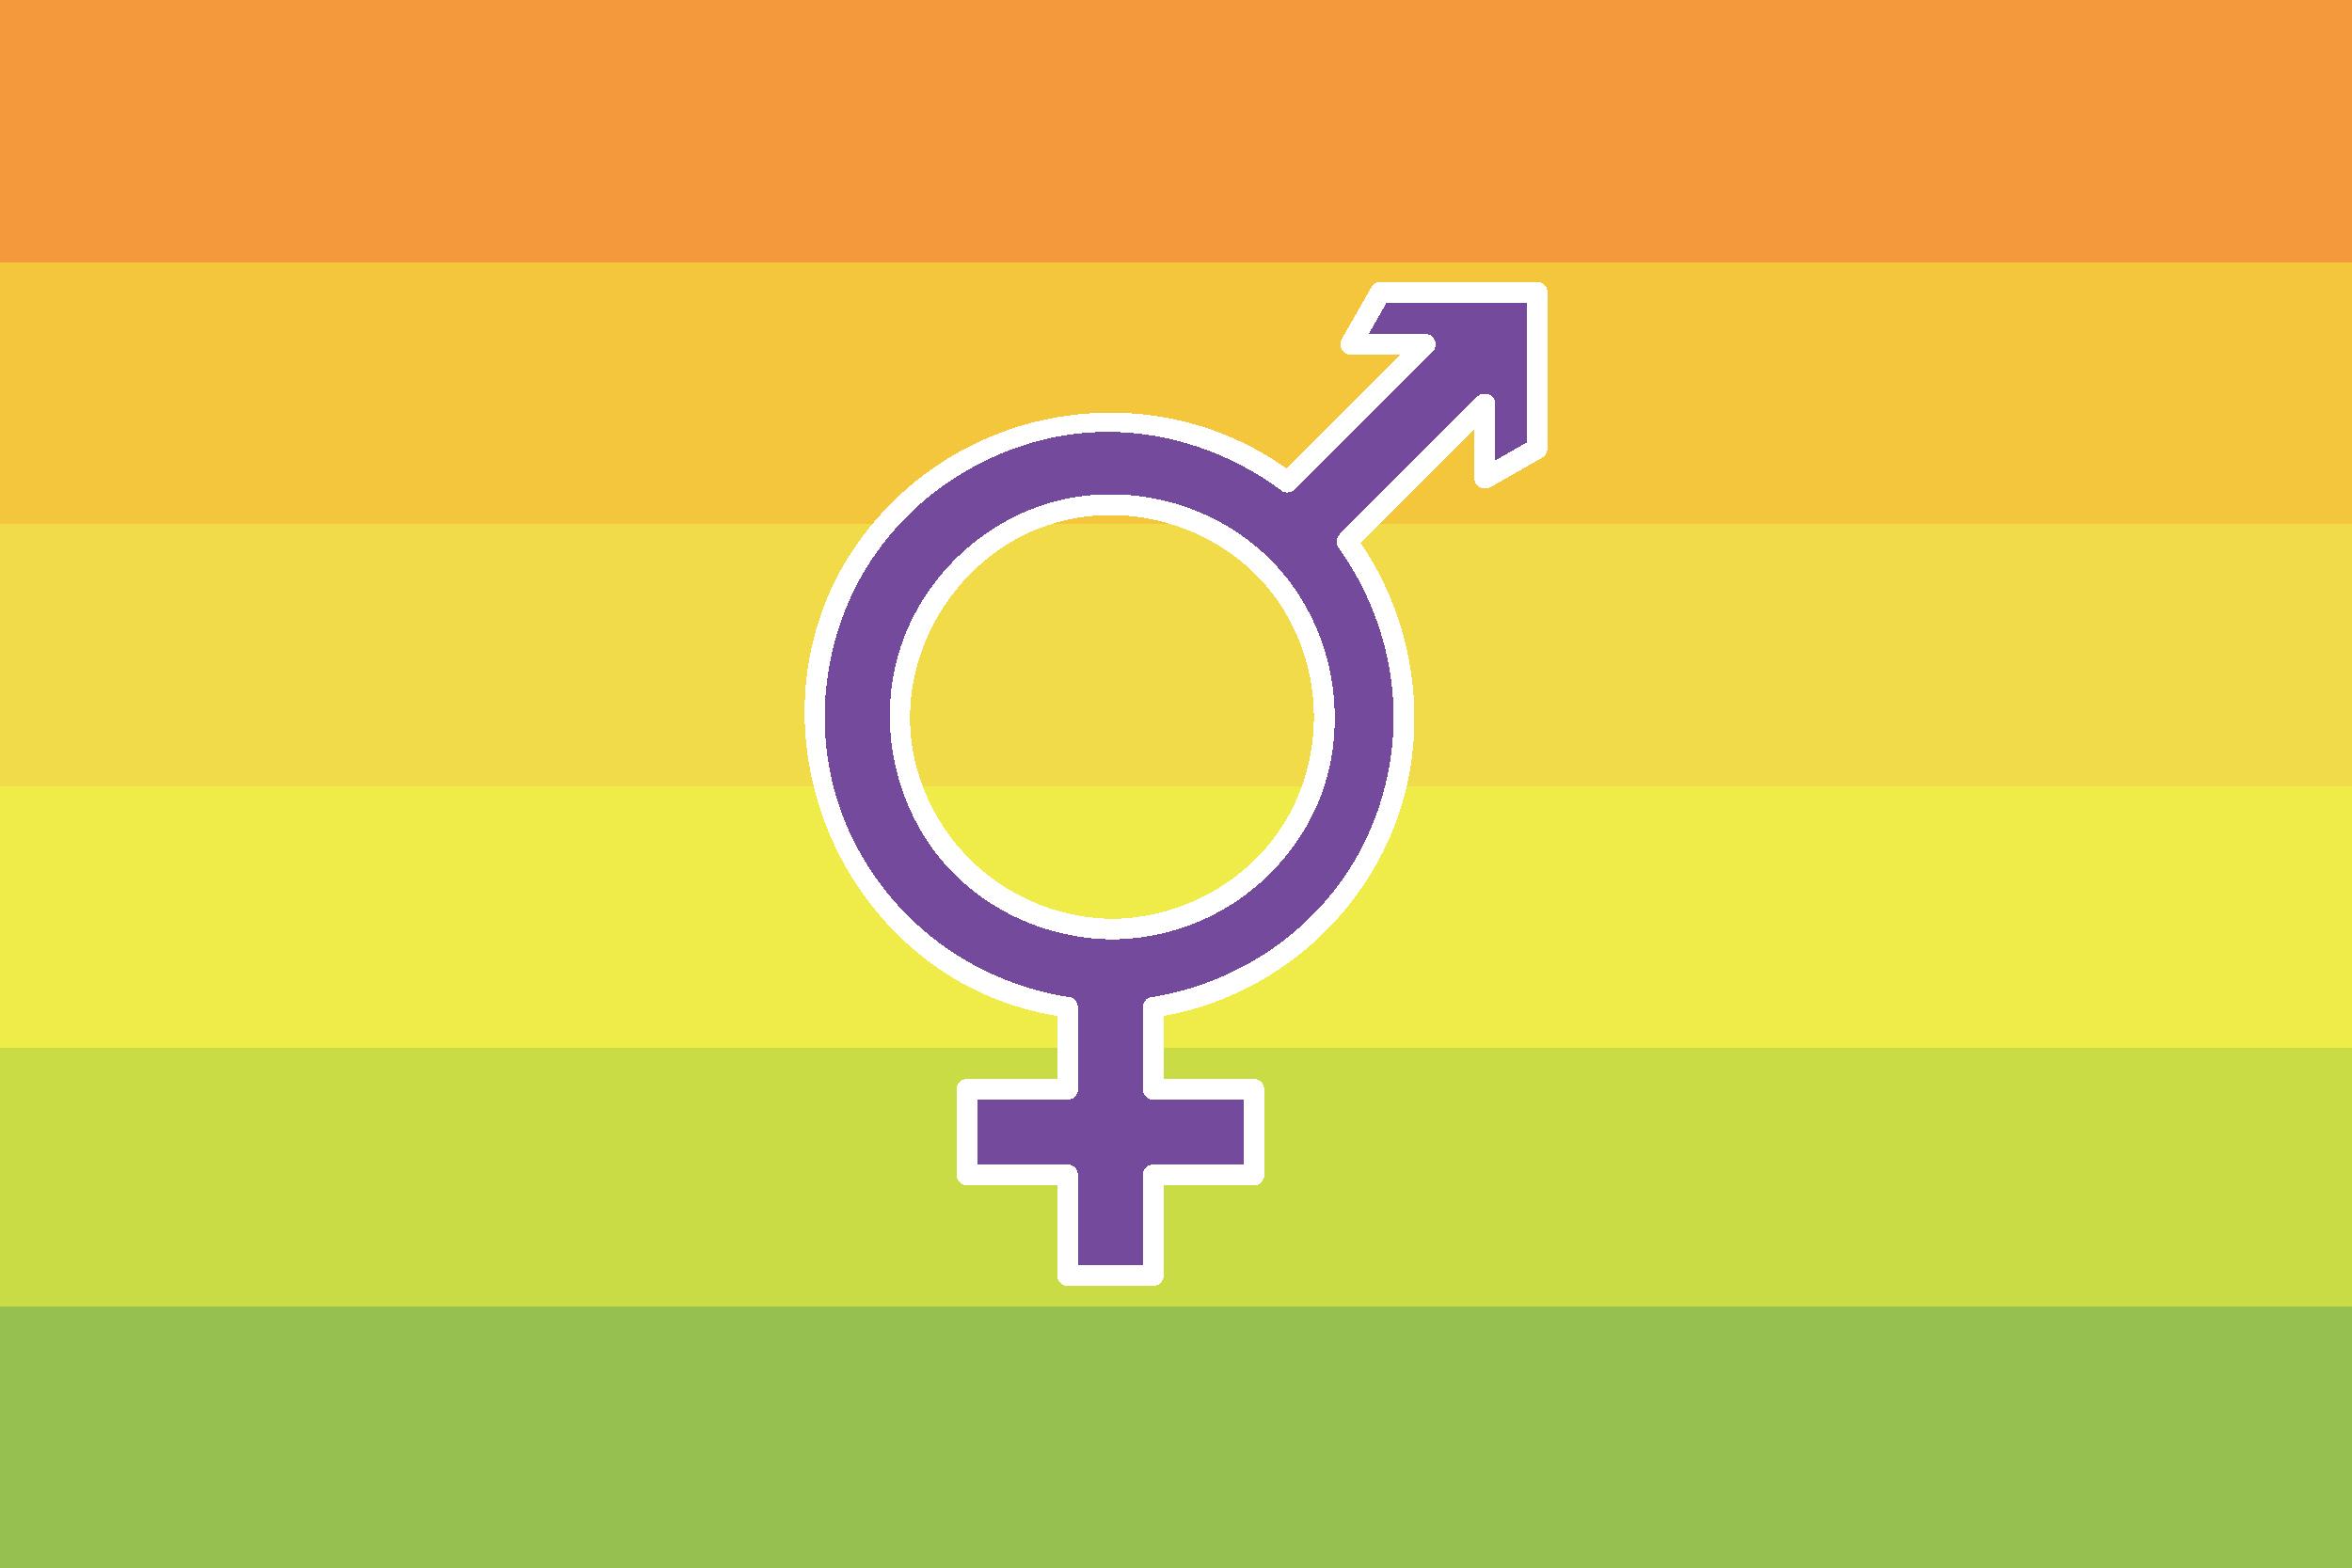 Children's Gender Identity Hotline Sees Huge Spike in Calls